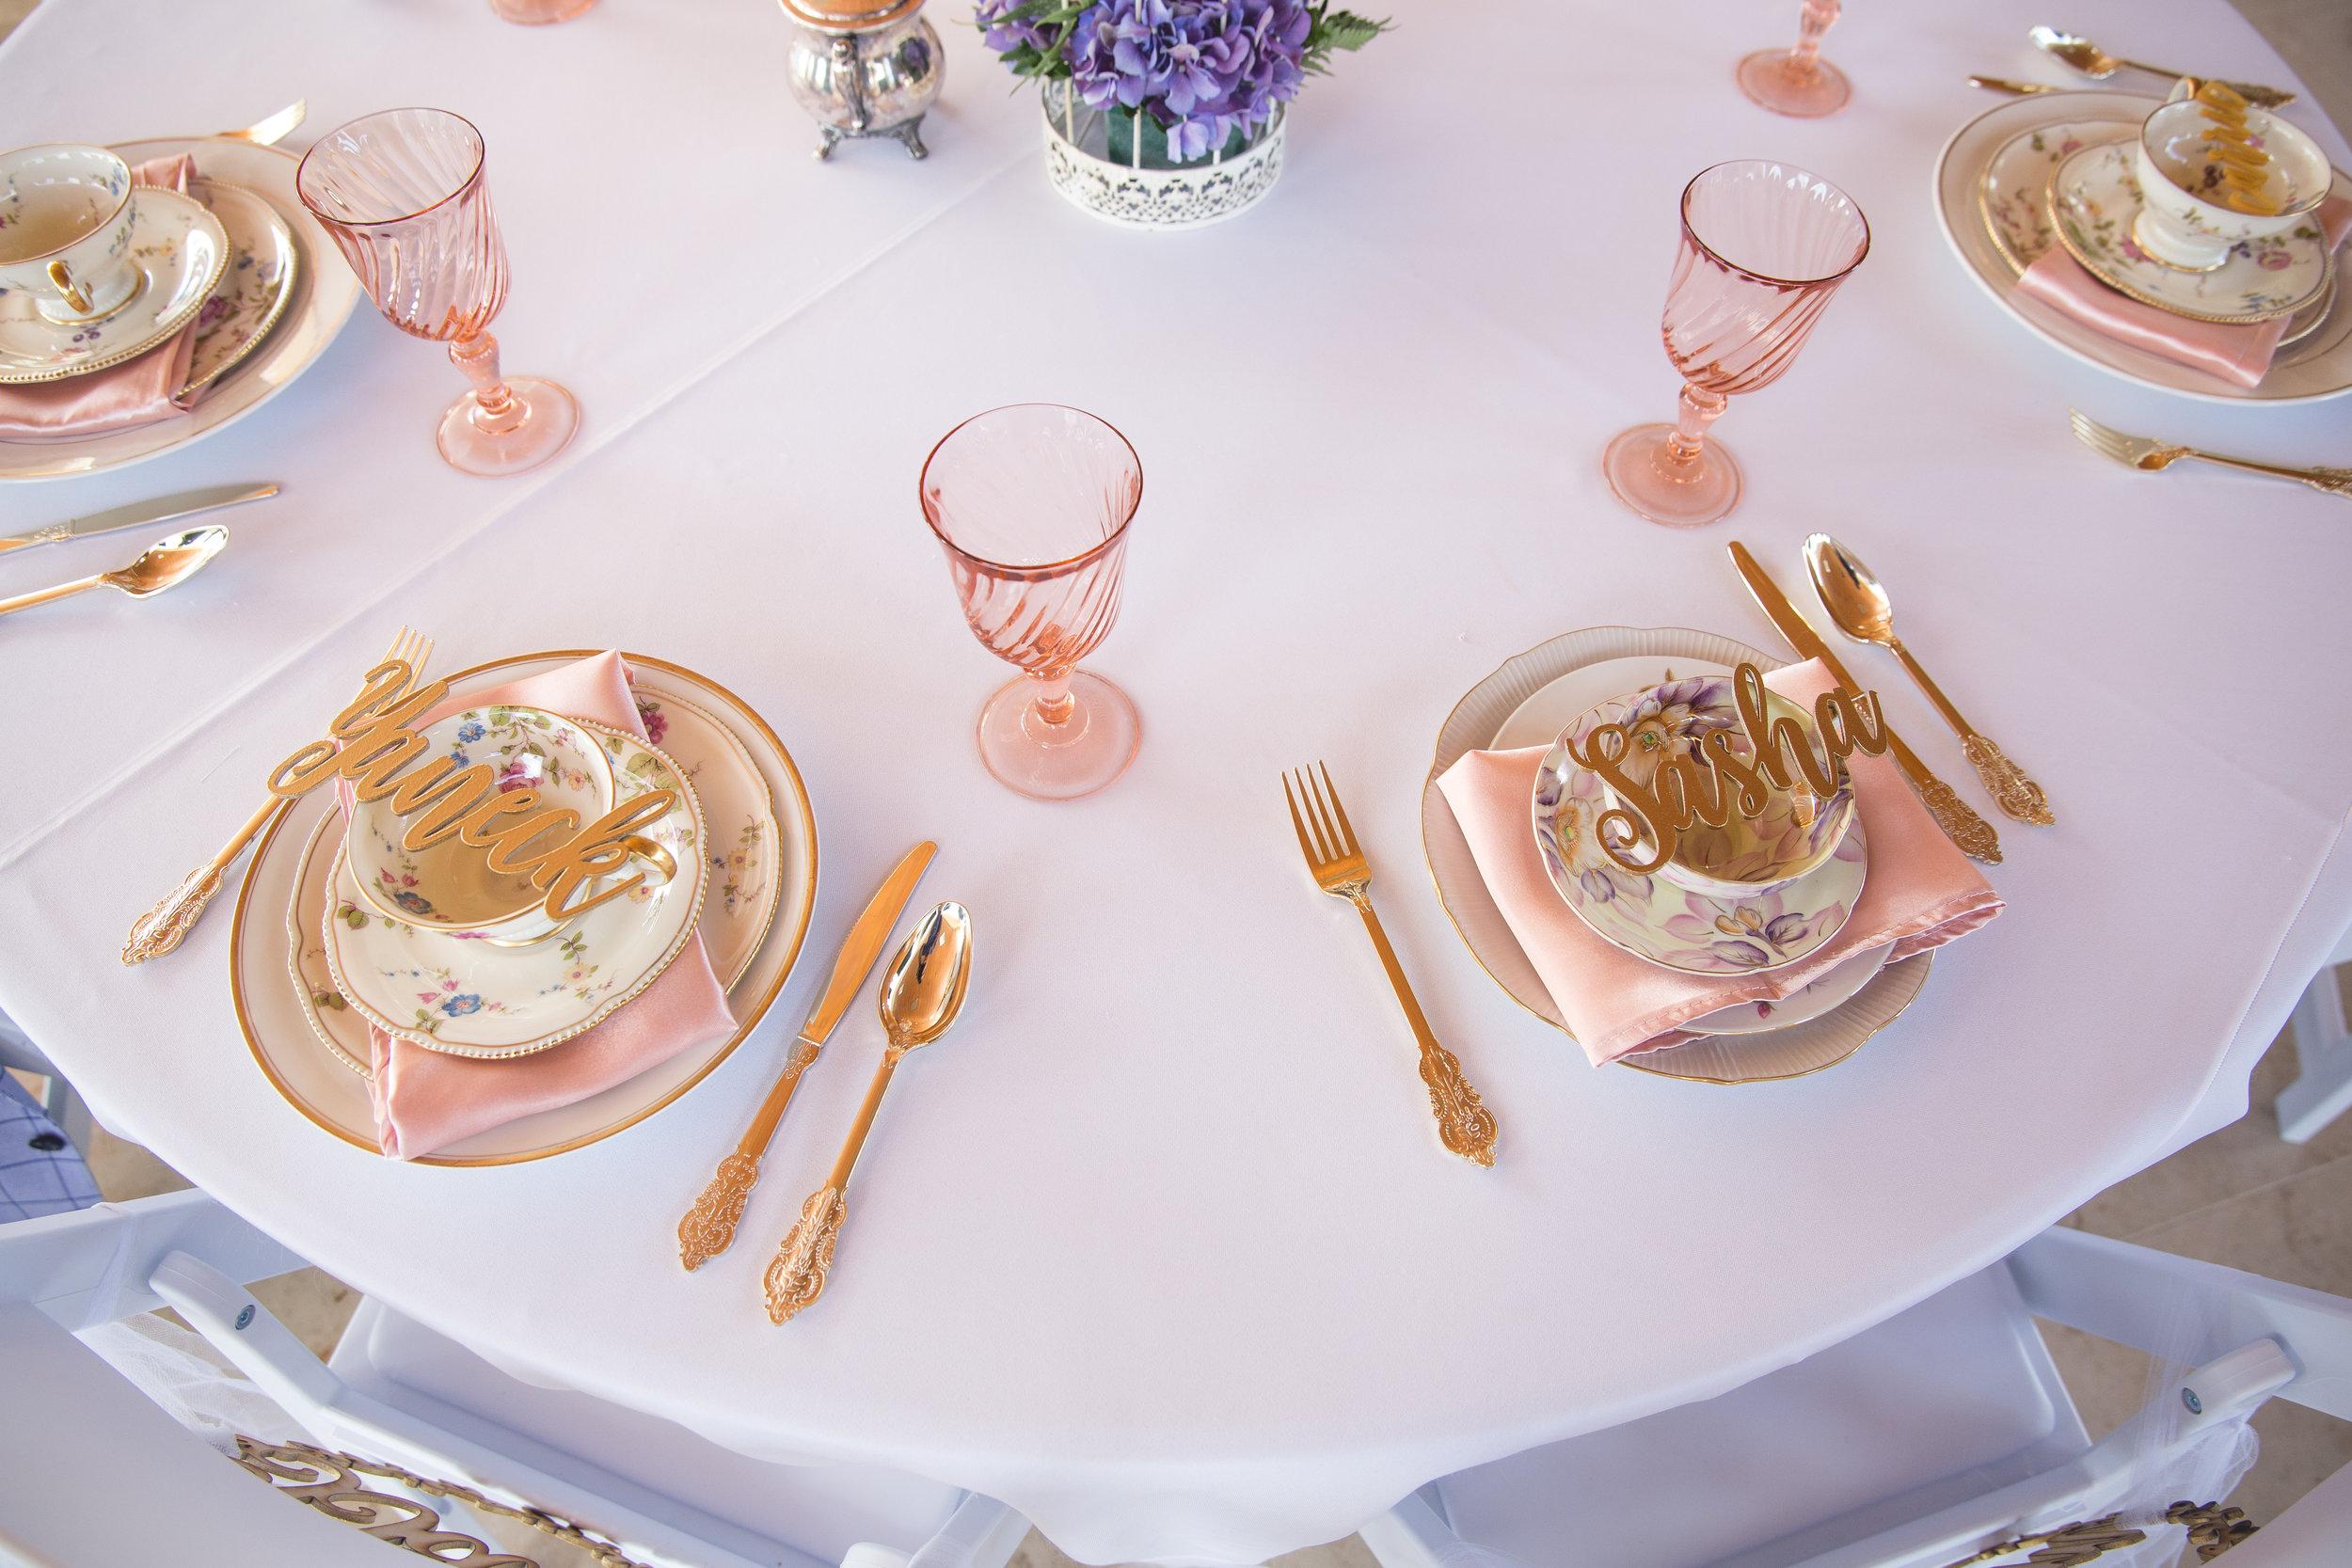 Rose Champagne Satin Napkins -$.50 each